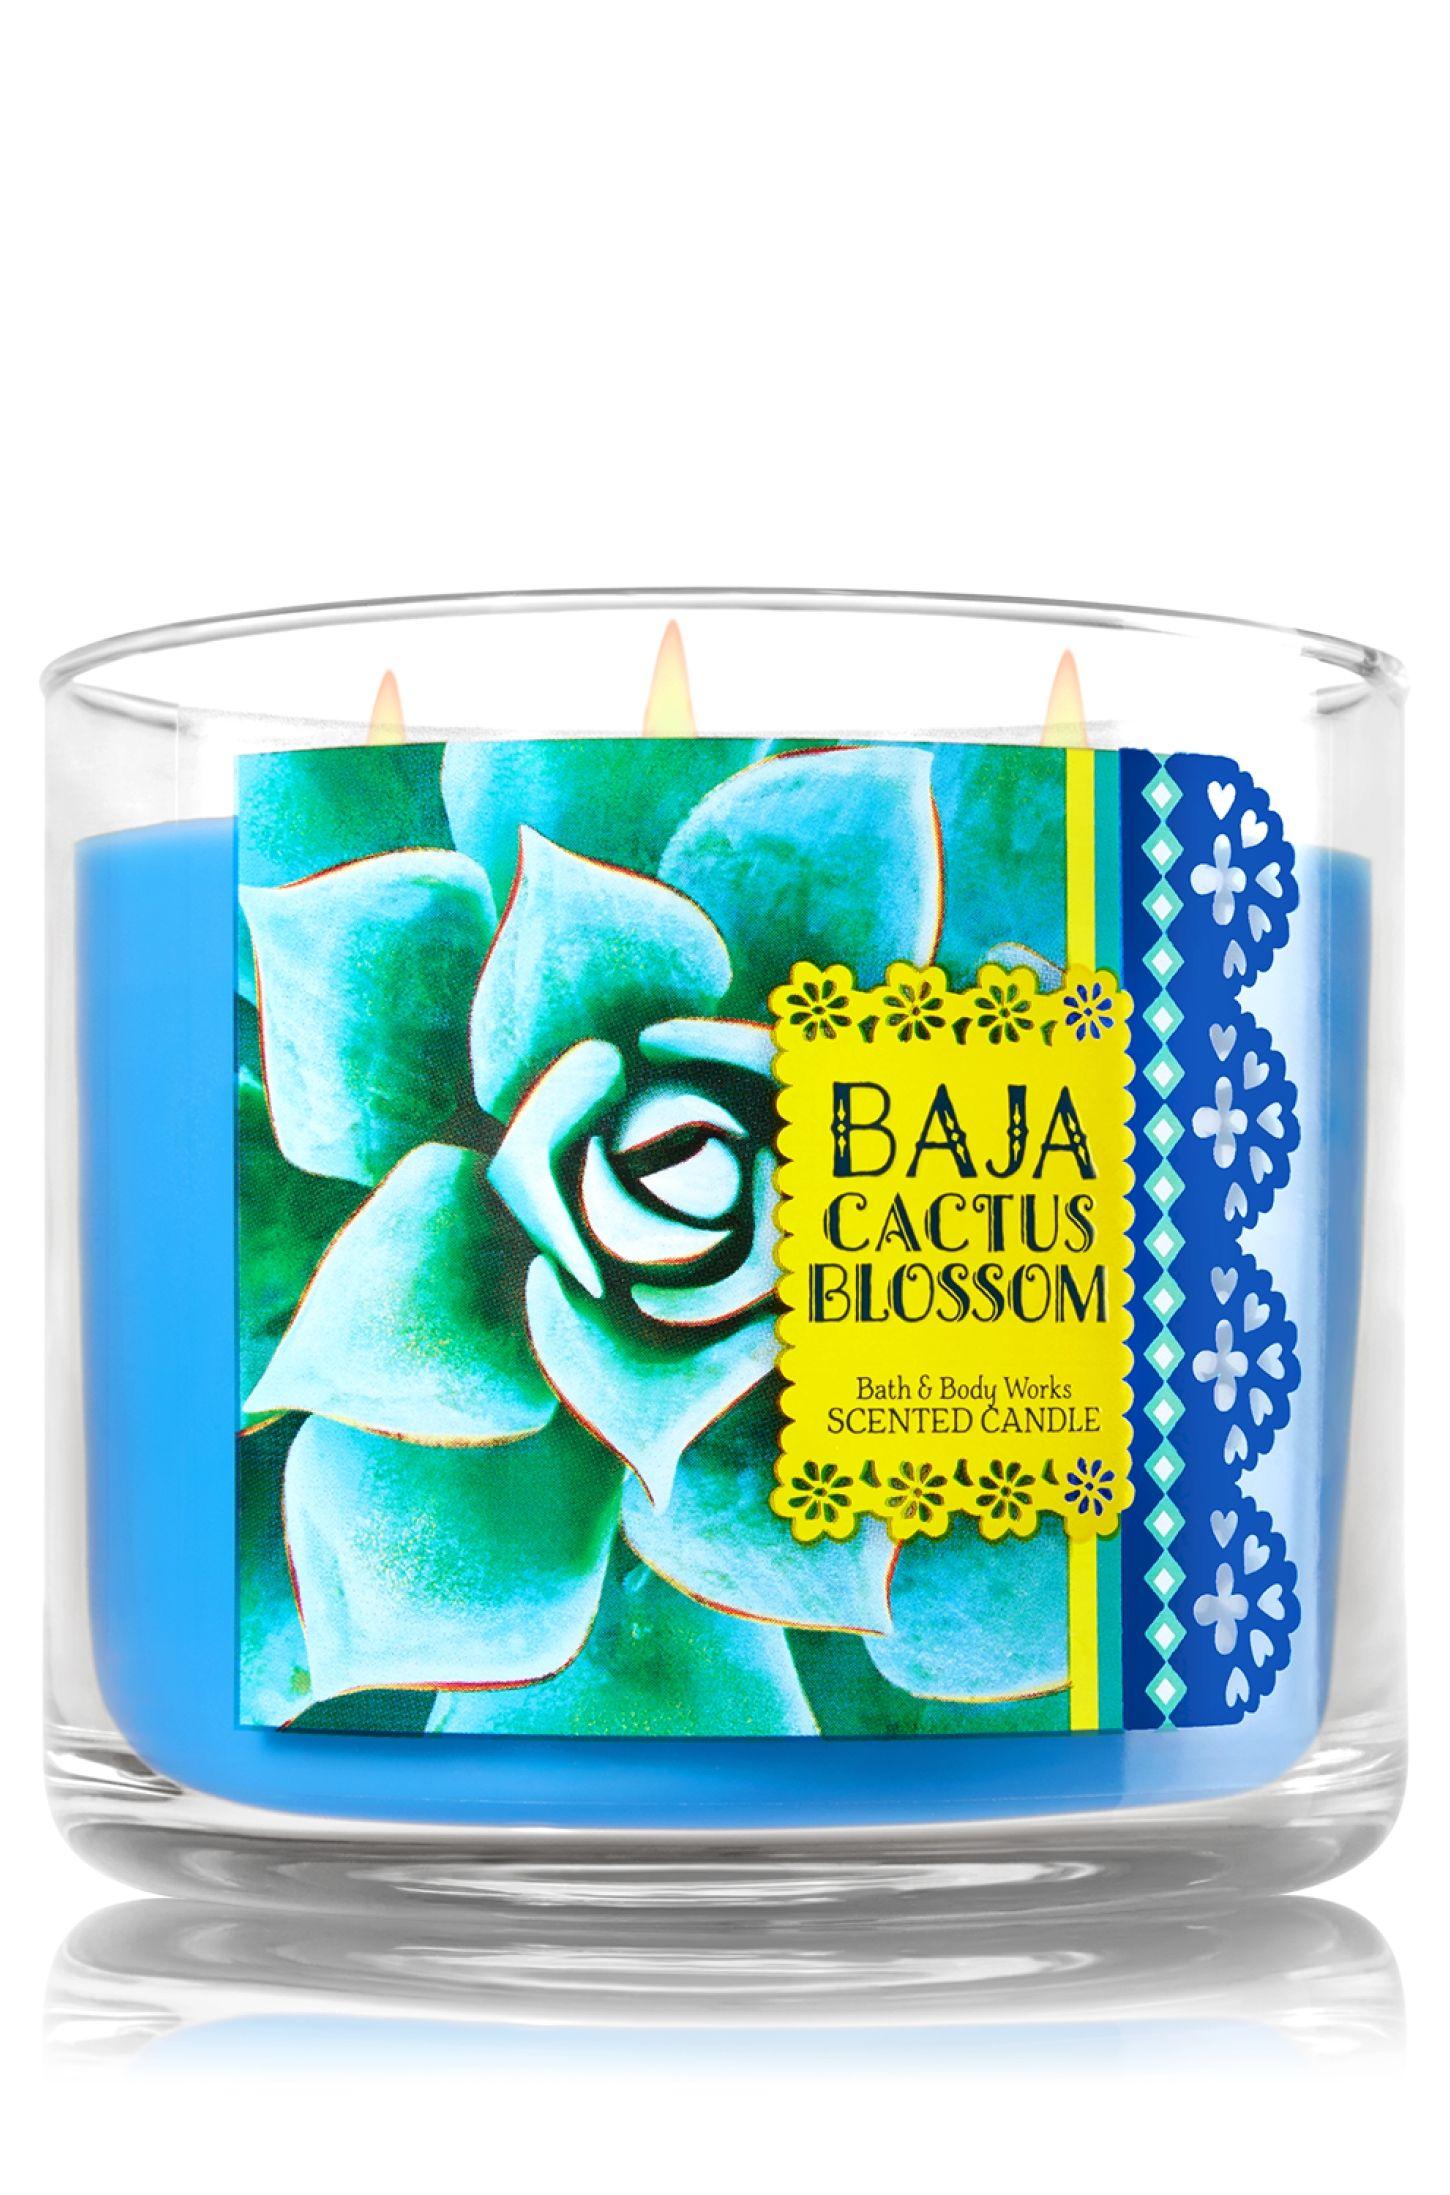 Baja Cactus Blossom 3-Wick Candle - Home Fragrance 1037181 - Bath ...